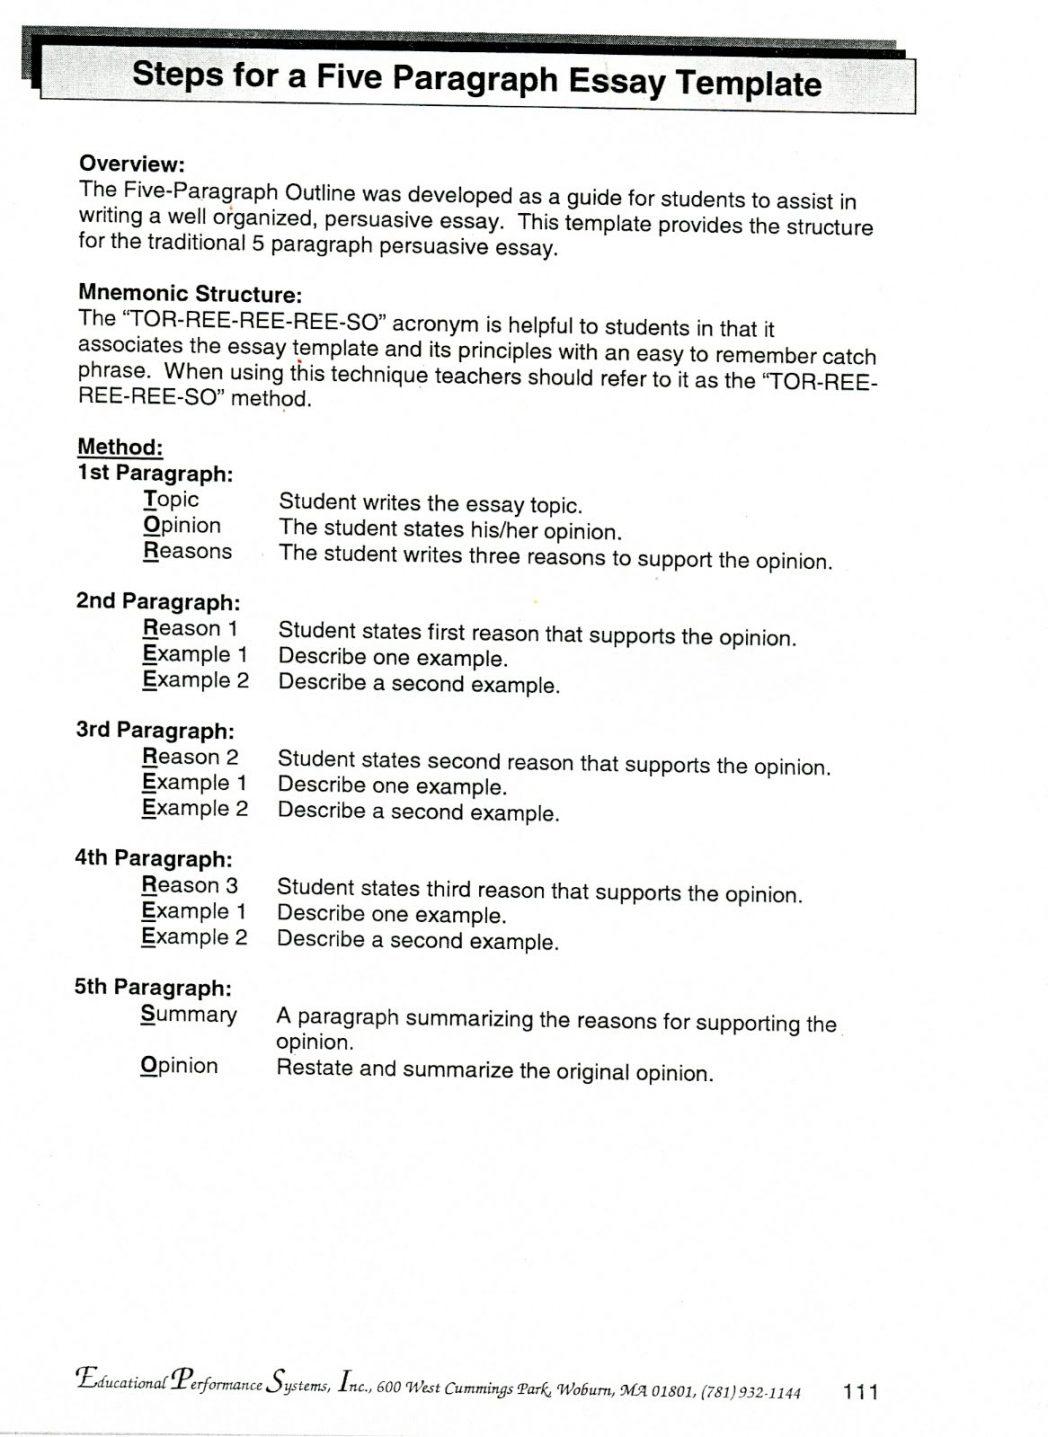 017 Persuade Essay Writing Persuasive Argumentative Sample 5th Grade Exa Dareles Informative Samples Pdf Descriptive Expository Opinion 1048x1437 For Impressive Essays Written By Fifth Graders A Full